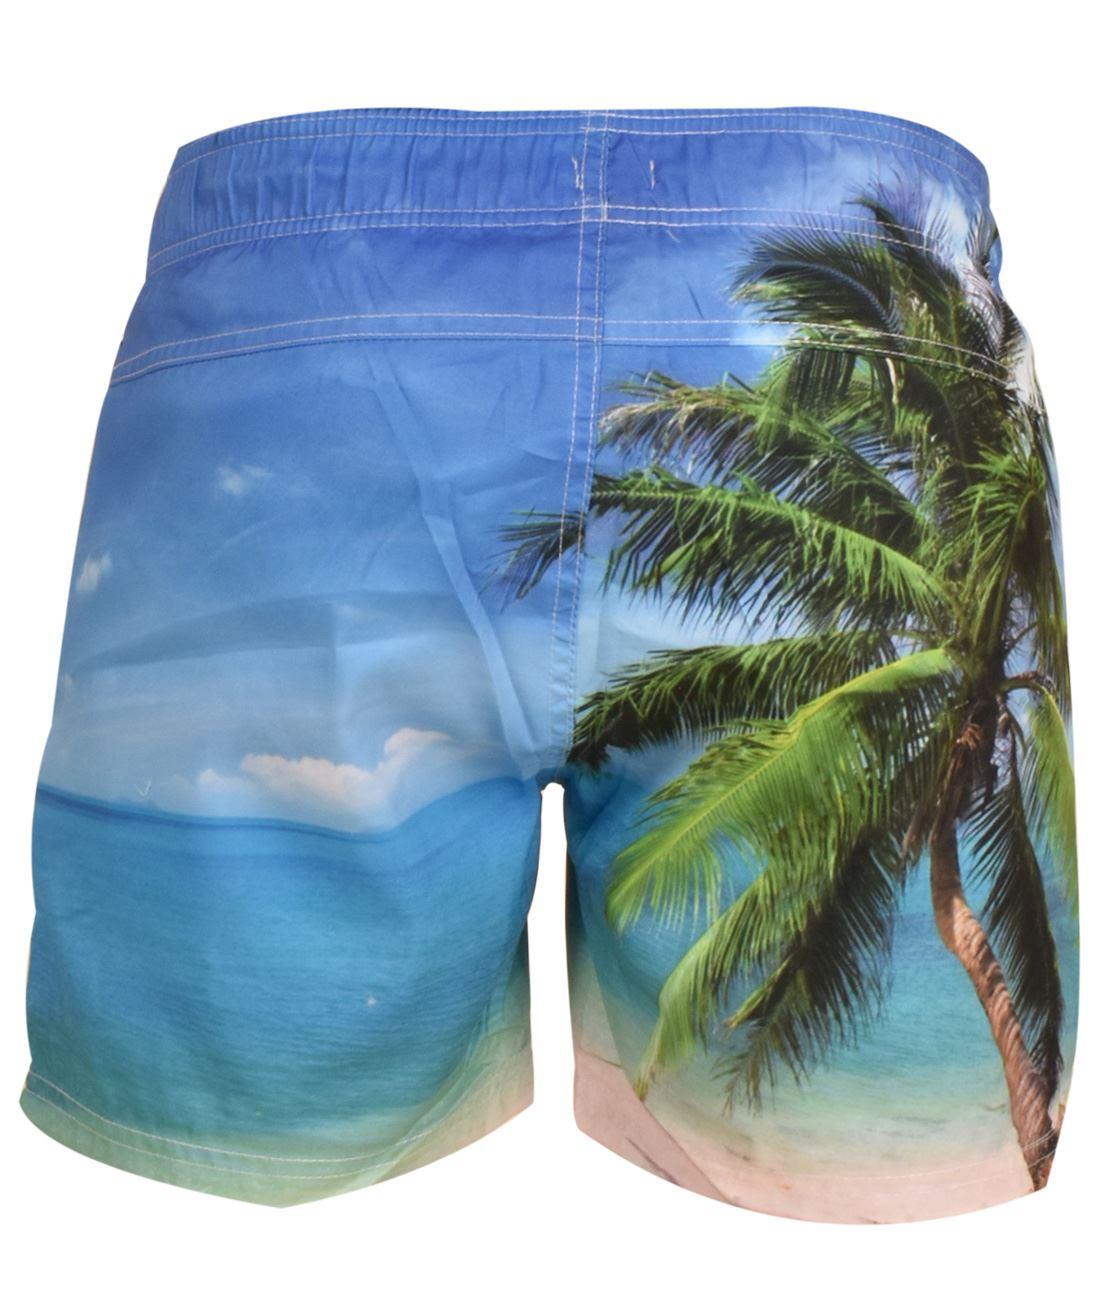 Crosshatch-Hawaiin-Sun-Set-Mens-Holiday-Swim-Shorts-Summer-Beach-Trunks-S-2XL thumbnail 5